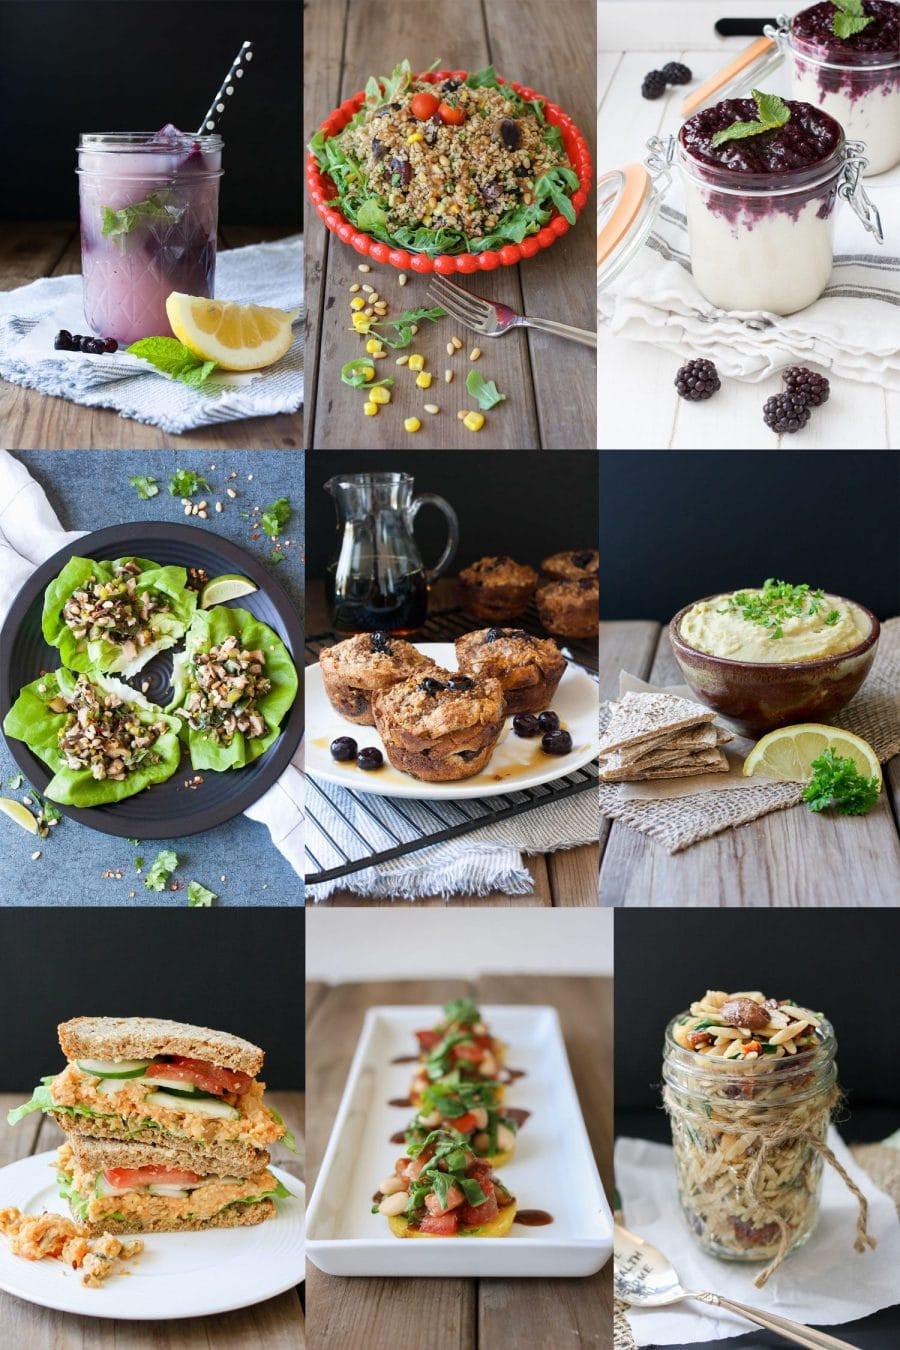 Vegan Easter Dinner Ideas  16 Ways To Make Sure Your Vegan Easter Is Tasty Veggies